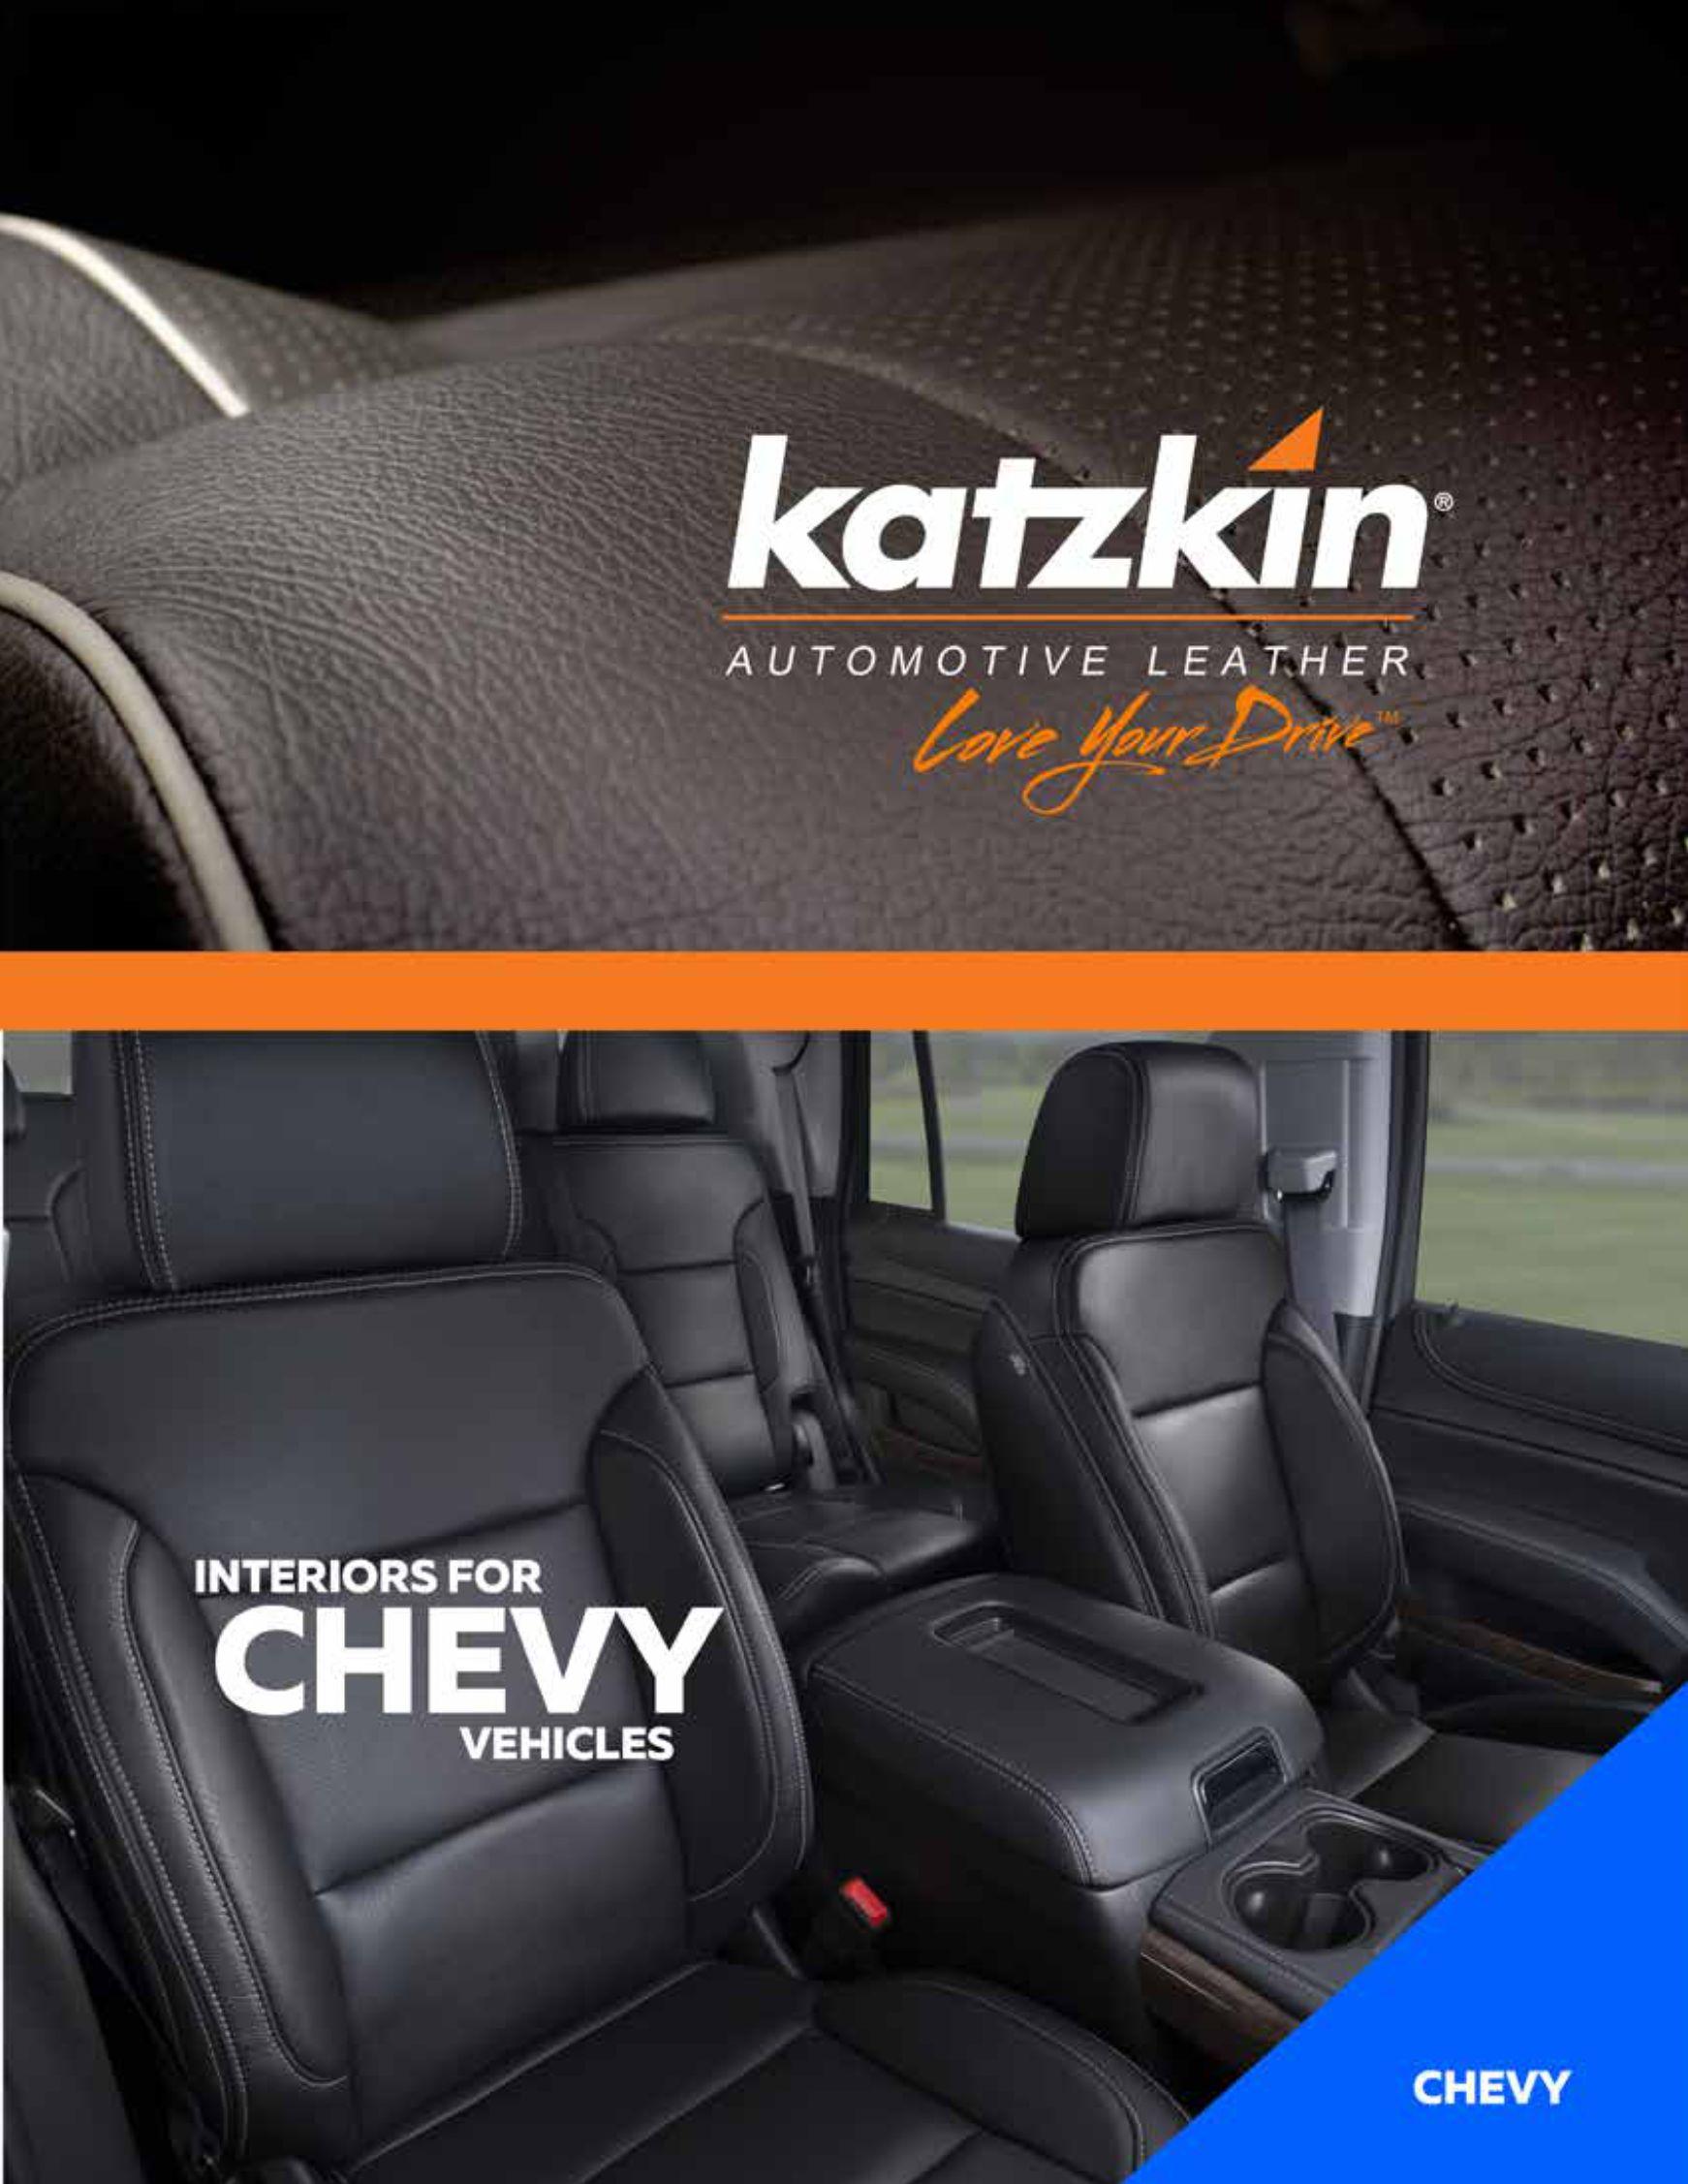 2018 Chevy Bi-fold